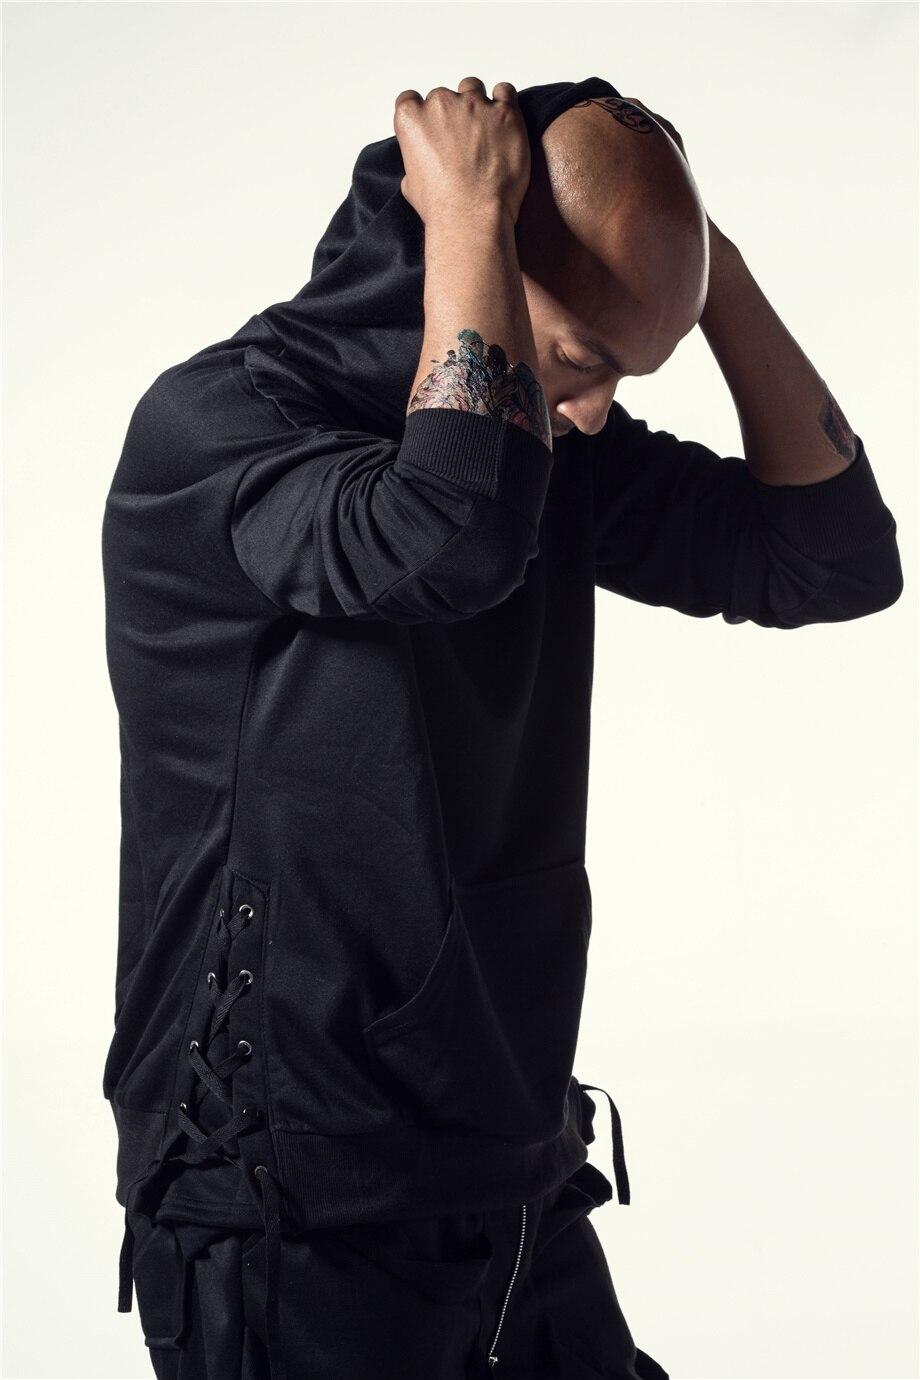 Una Reta Brand New Design Hoodie Men Fashion Sweatshirts Bandage Design Hip-Hop Style Plus Size M-5XL Pullover Sweatshirts Men 13